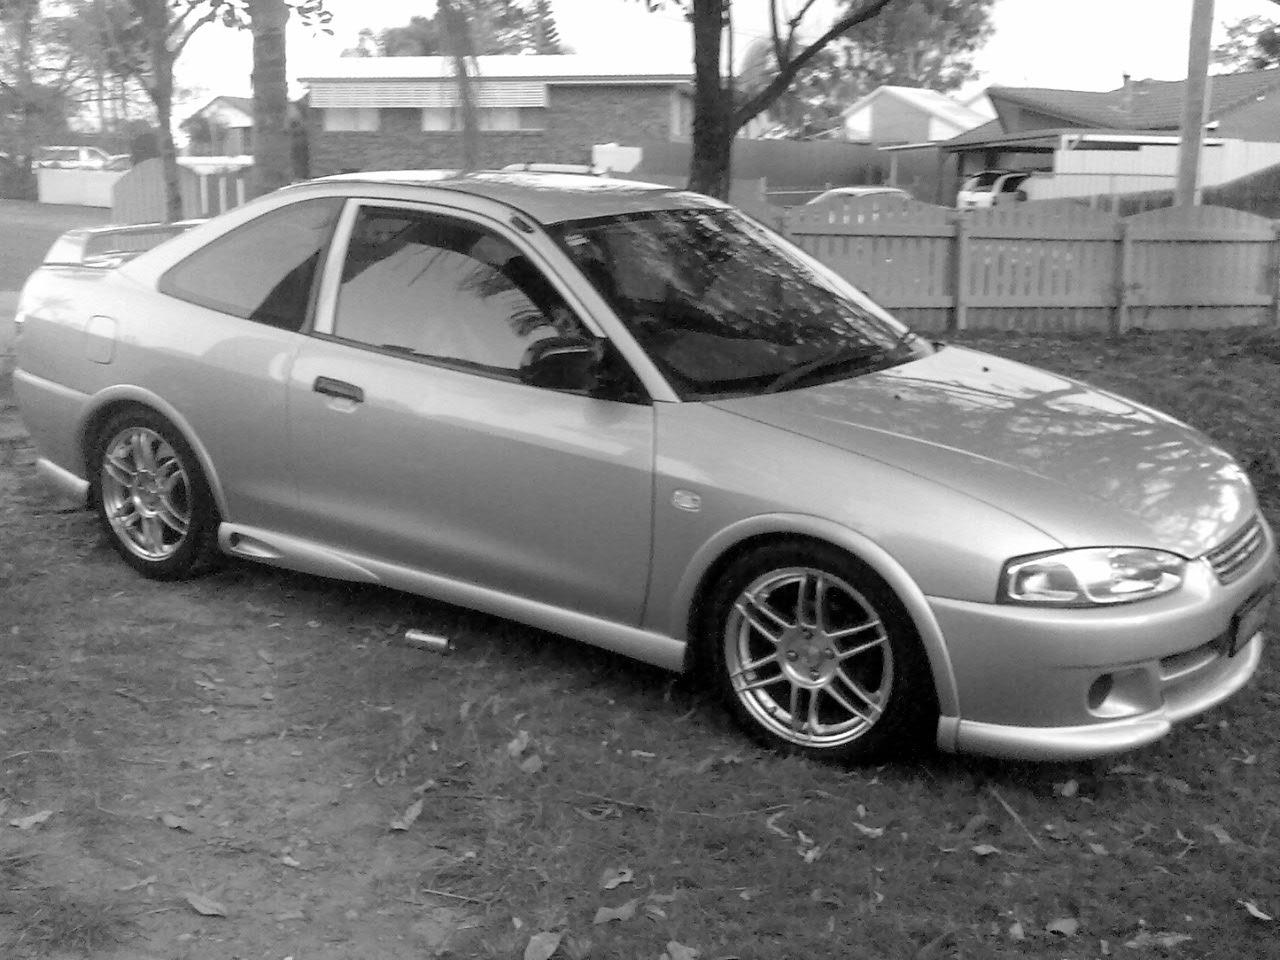 2003 Mitsubishi Lancer Pictures Cargurus